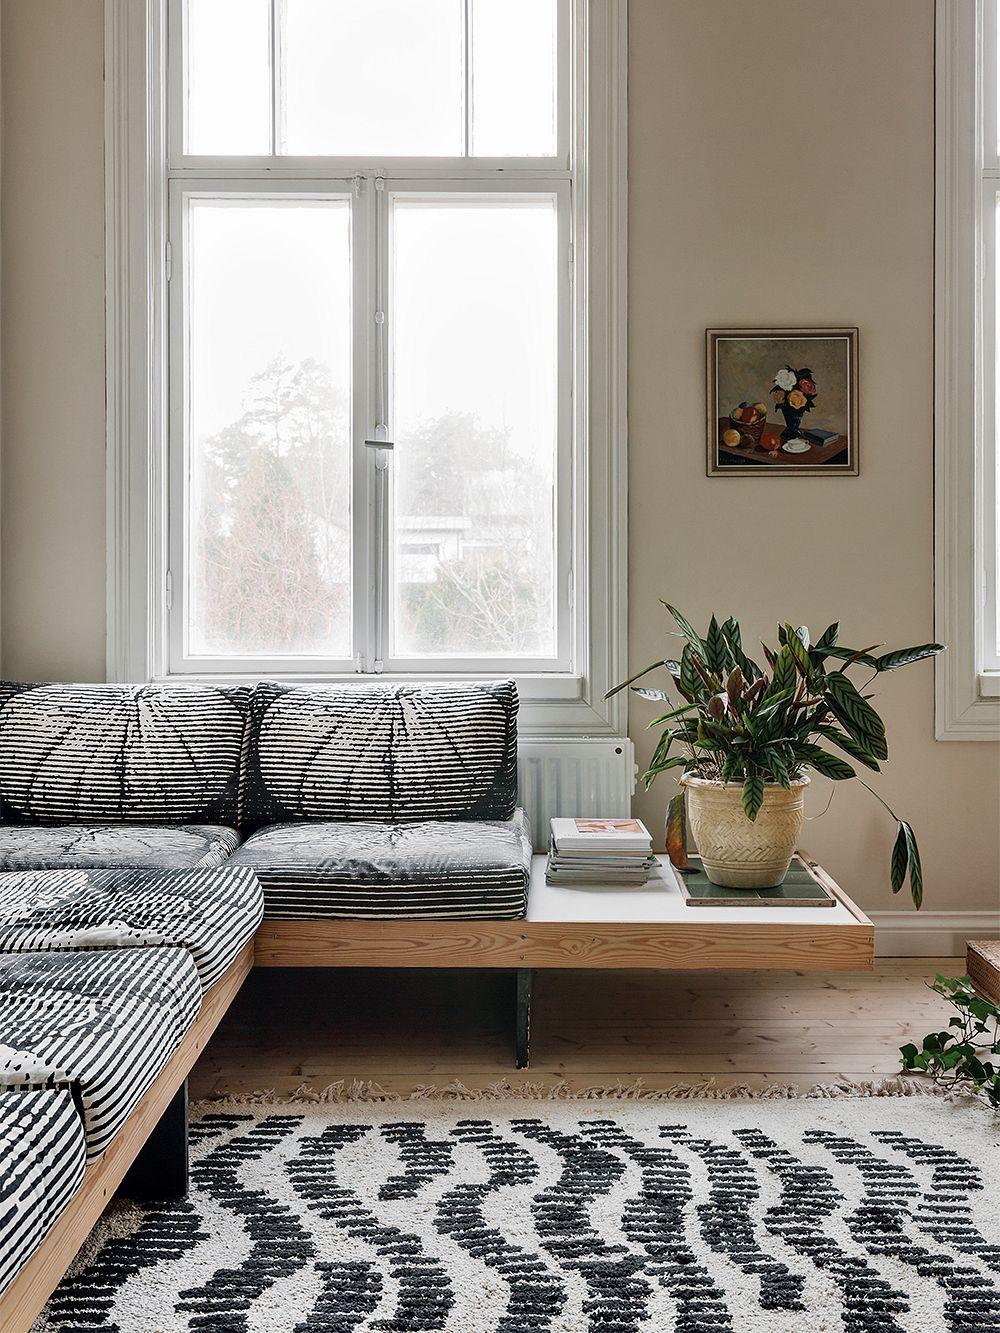 Vintage sofa upholstered with the Hedelmä fabric by Vuokko Eskolin-Nurmesniemi